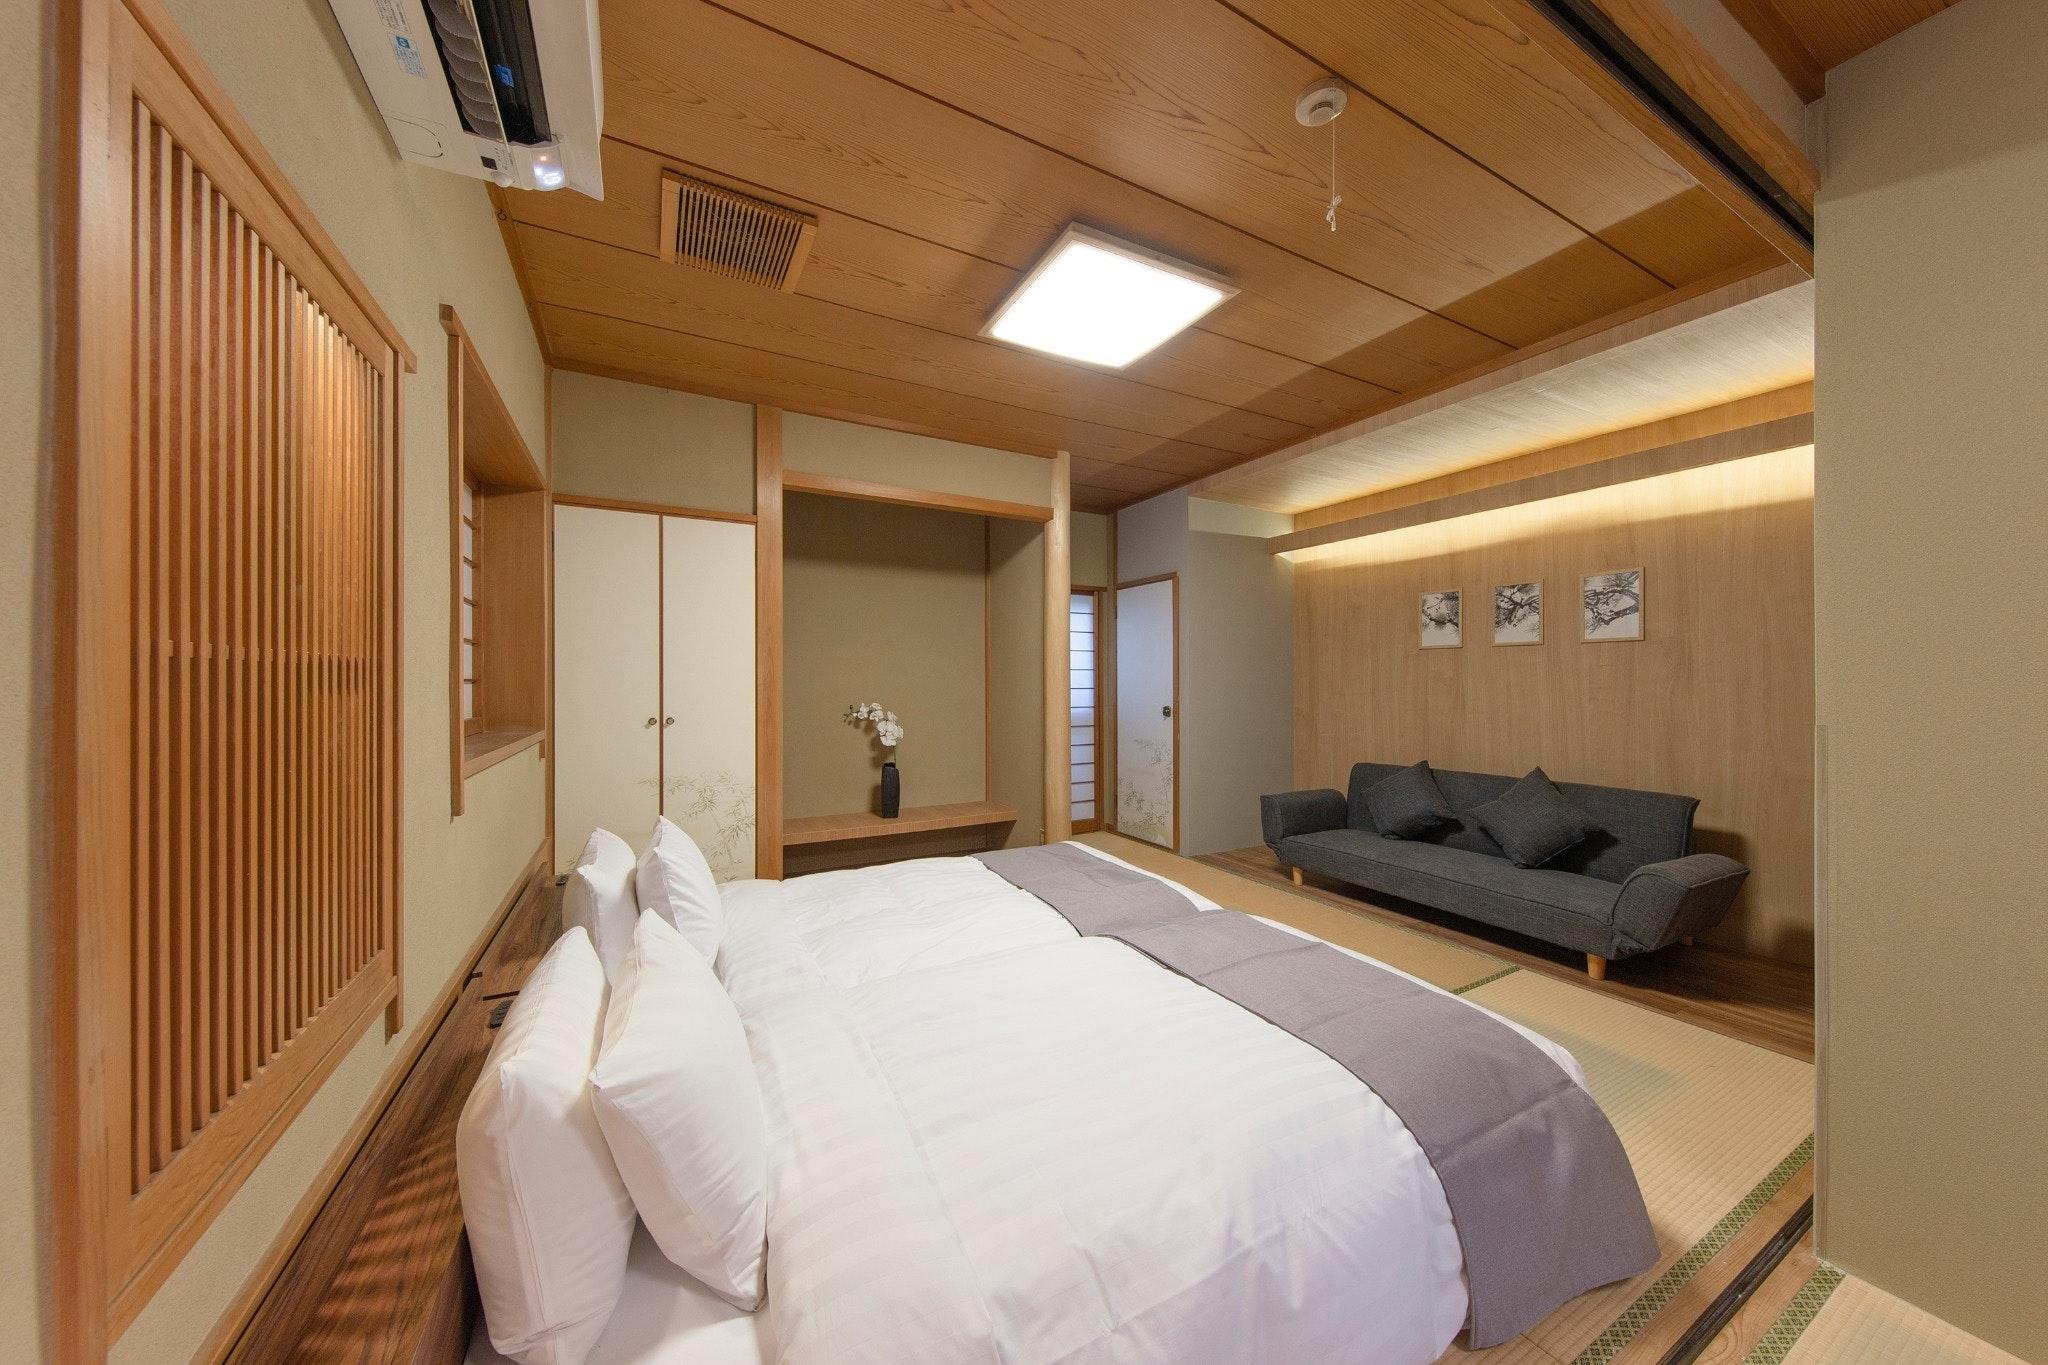 R1.東京新宿中心地.広々とした和風モダンお部屋.観光にも空港からも便利な立地/WiFi完備